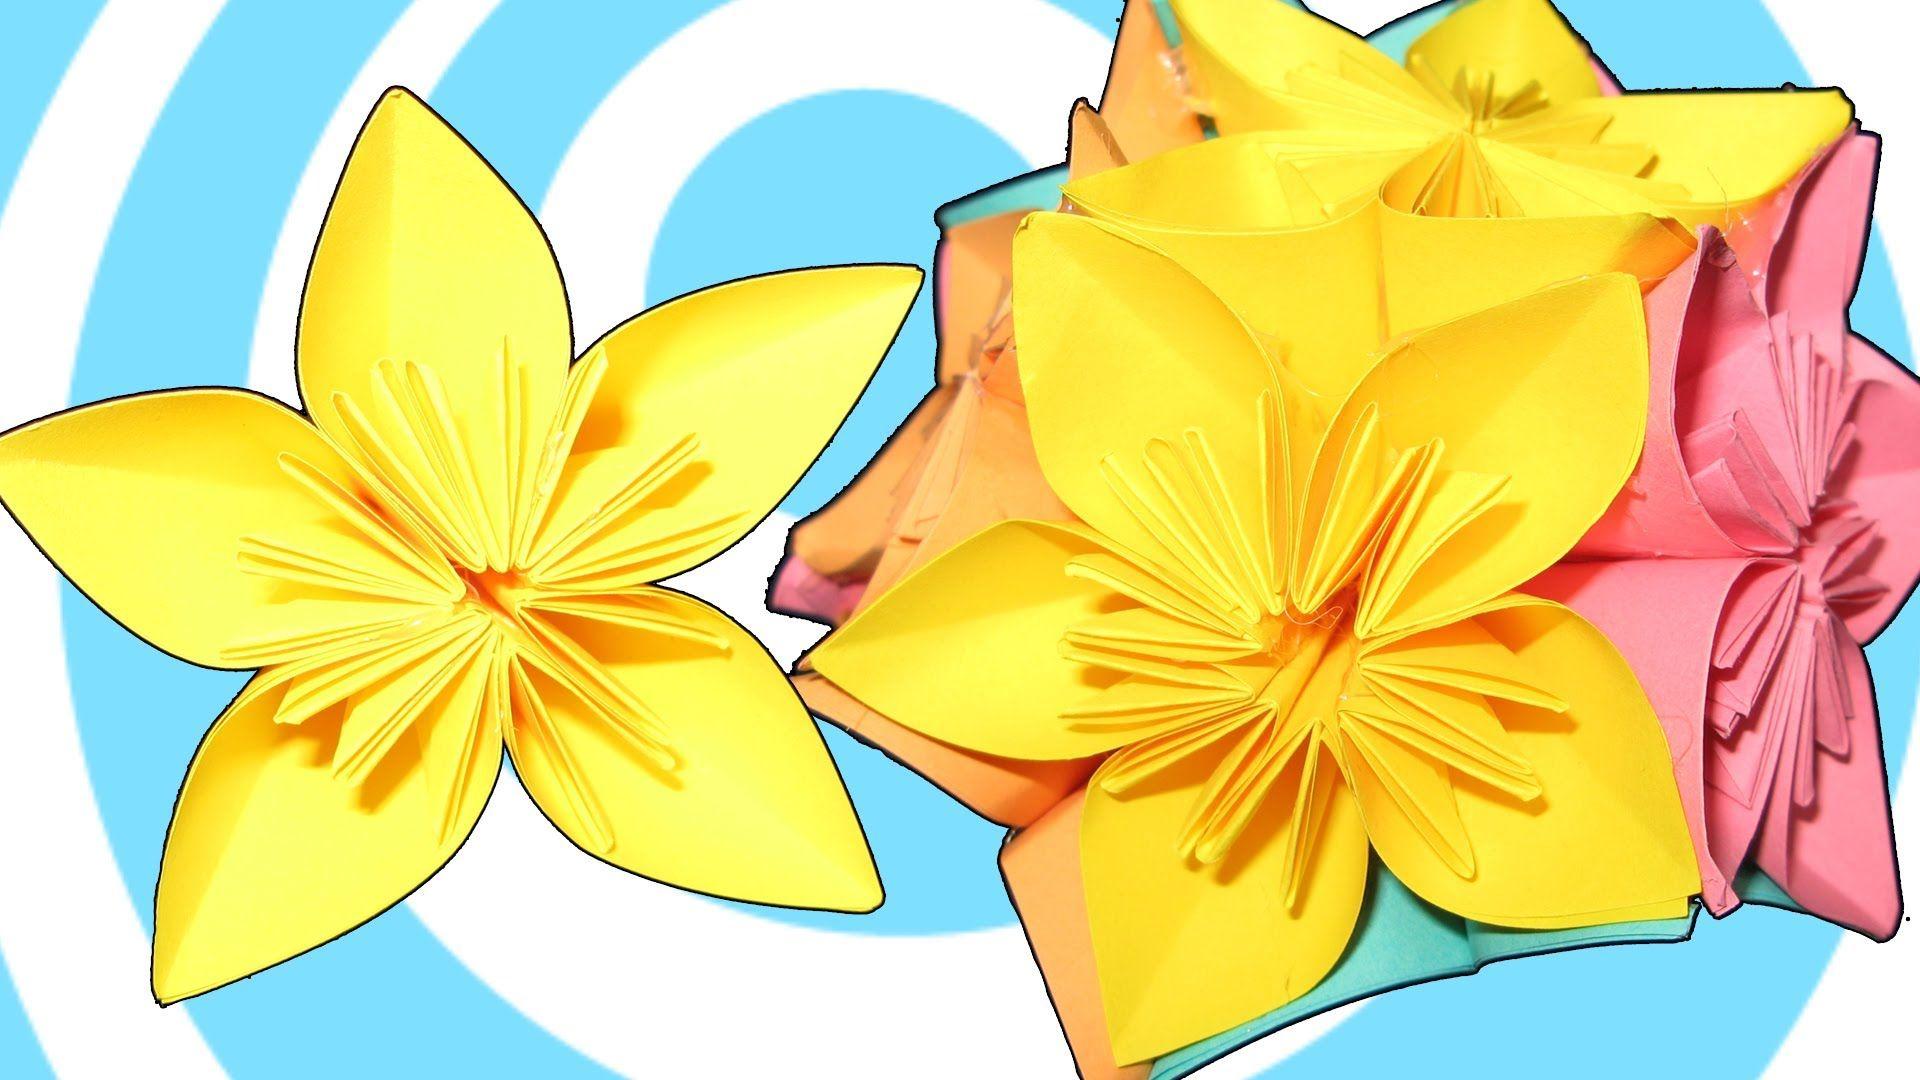 How To Make Origami Kusudama Flower Ball Video Tutorial Origami